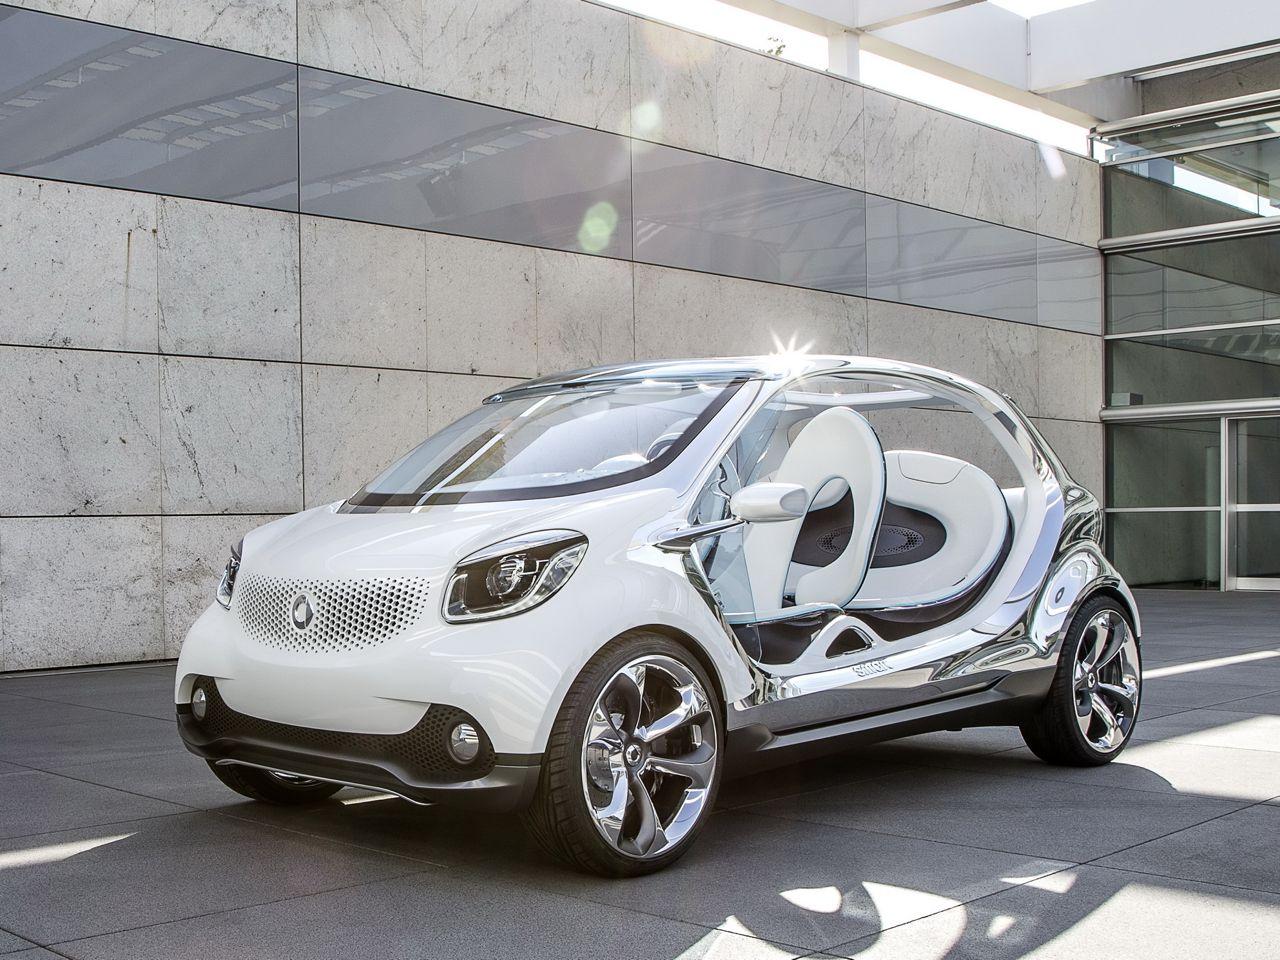 Smart FourJoy Concept front three quarters